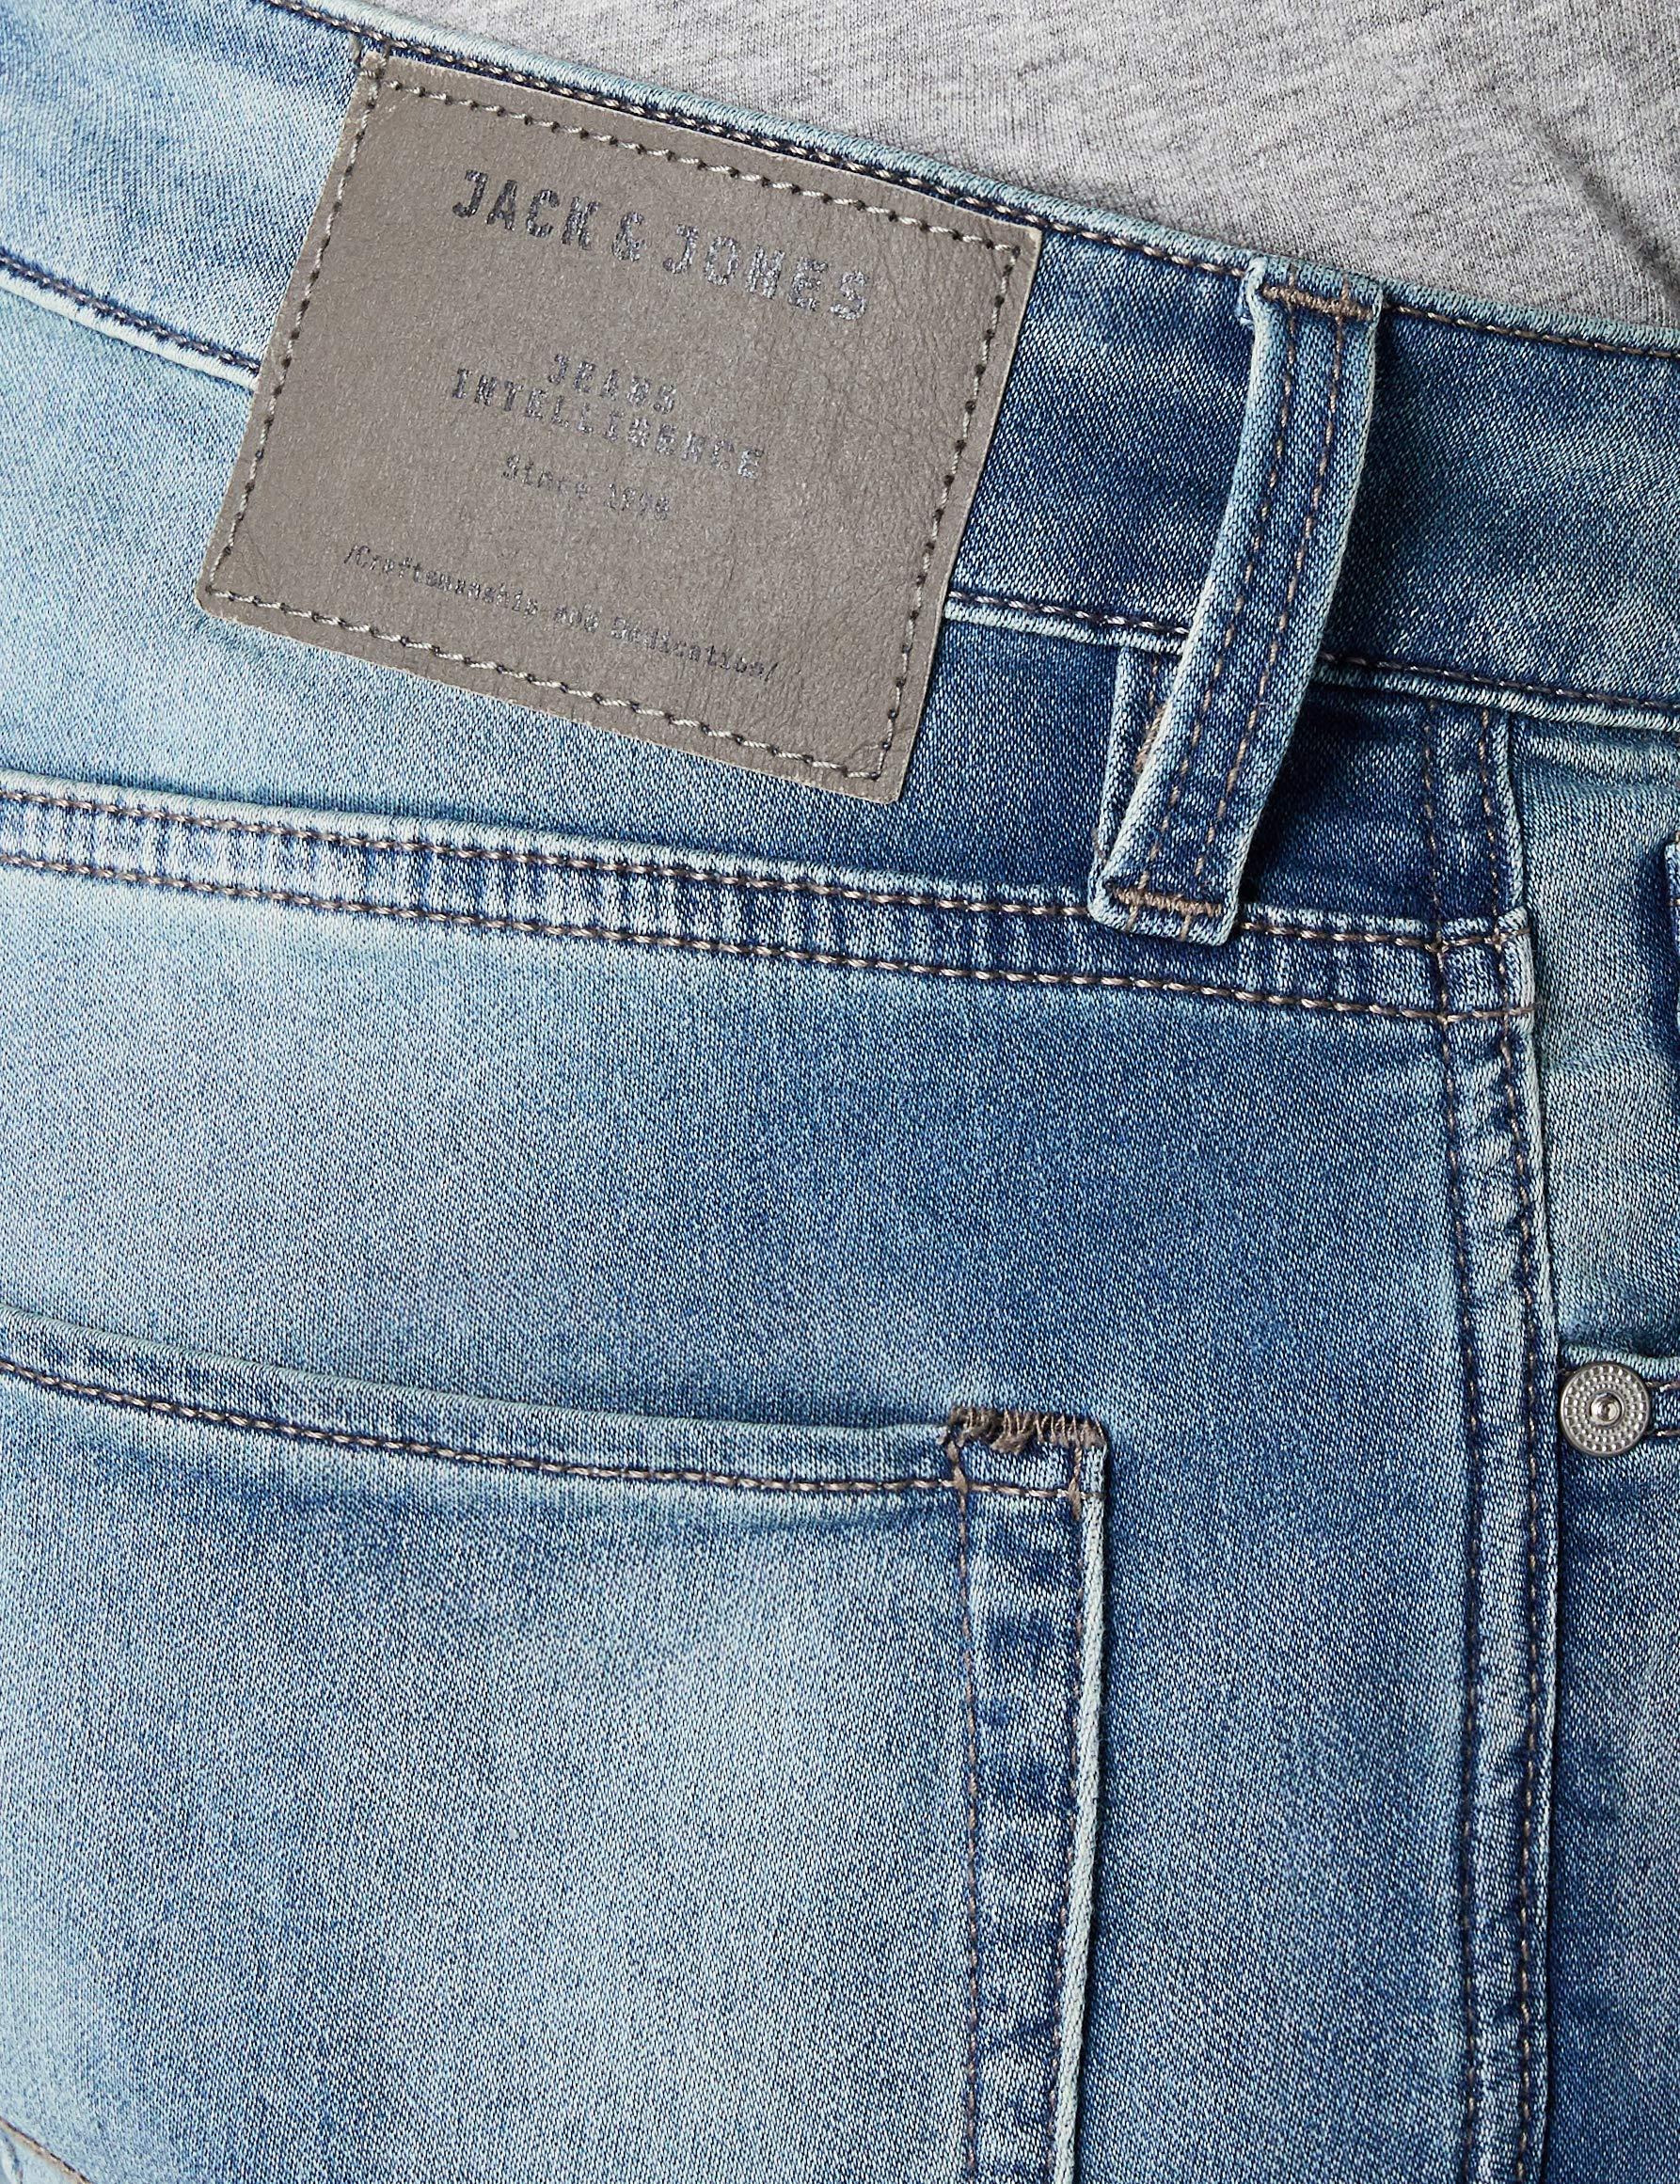 c22238726376 JACK   JONES Herren Shorts JJIRICK JJICON GE 797 I.K. STS, Blau Blue Denim,